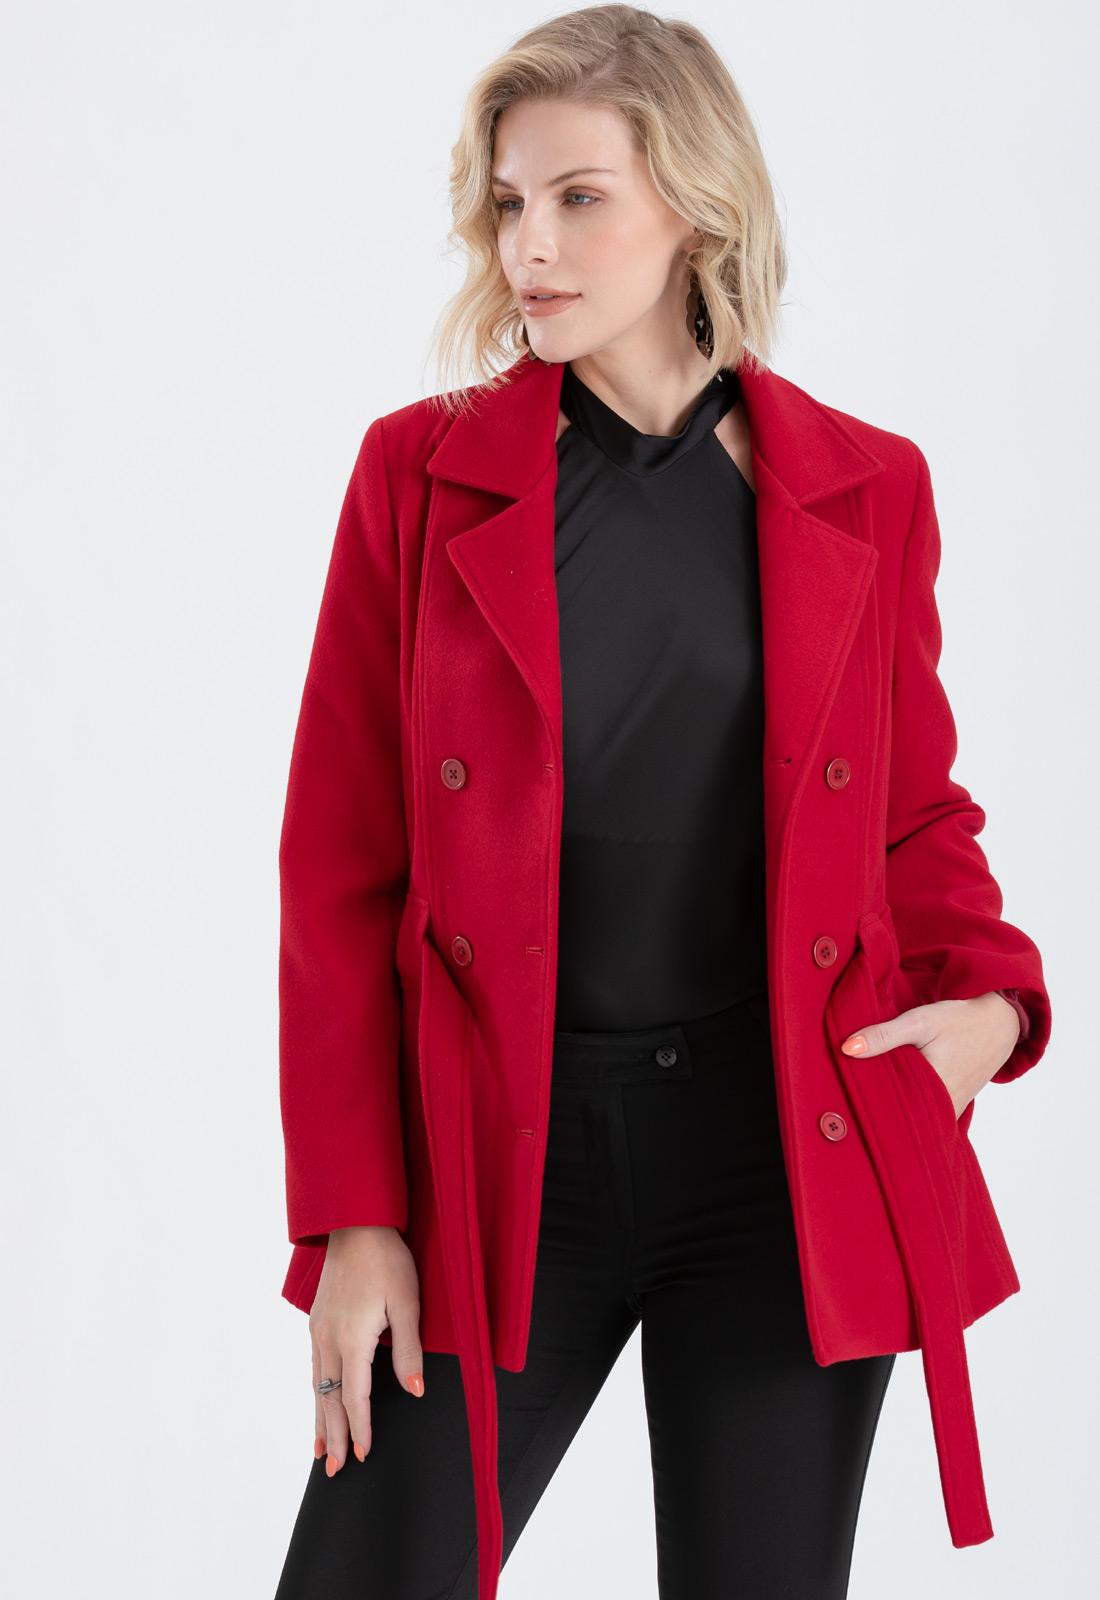 Casaco feminino vermelho plus size - Ref. 1145